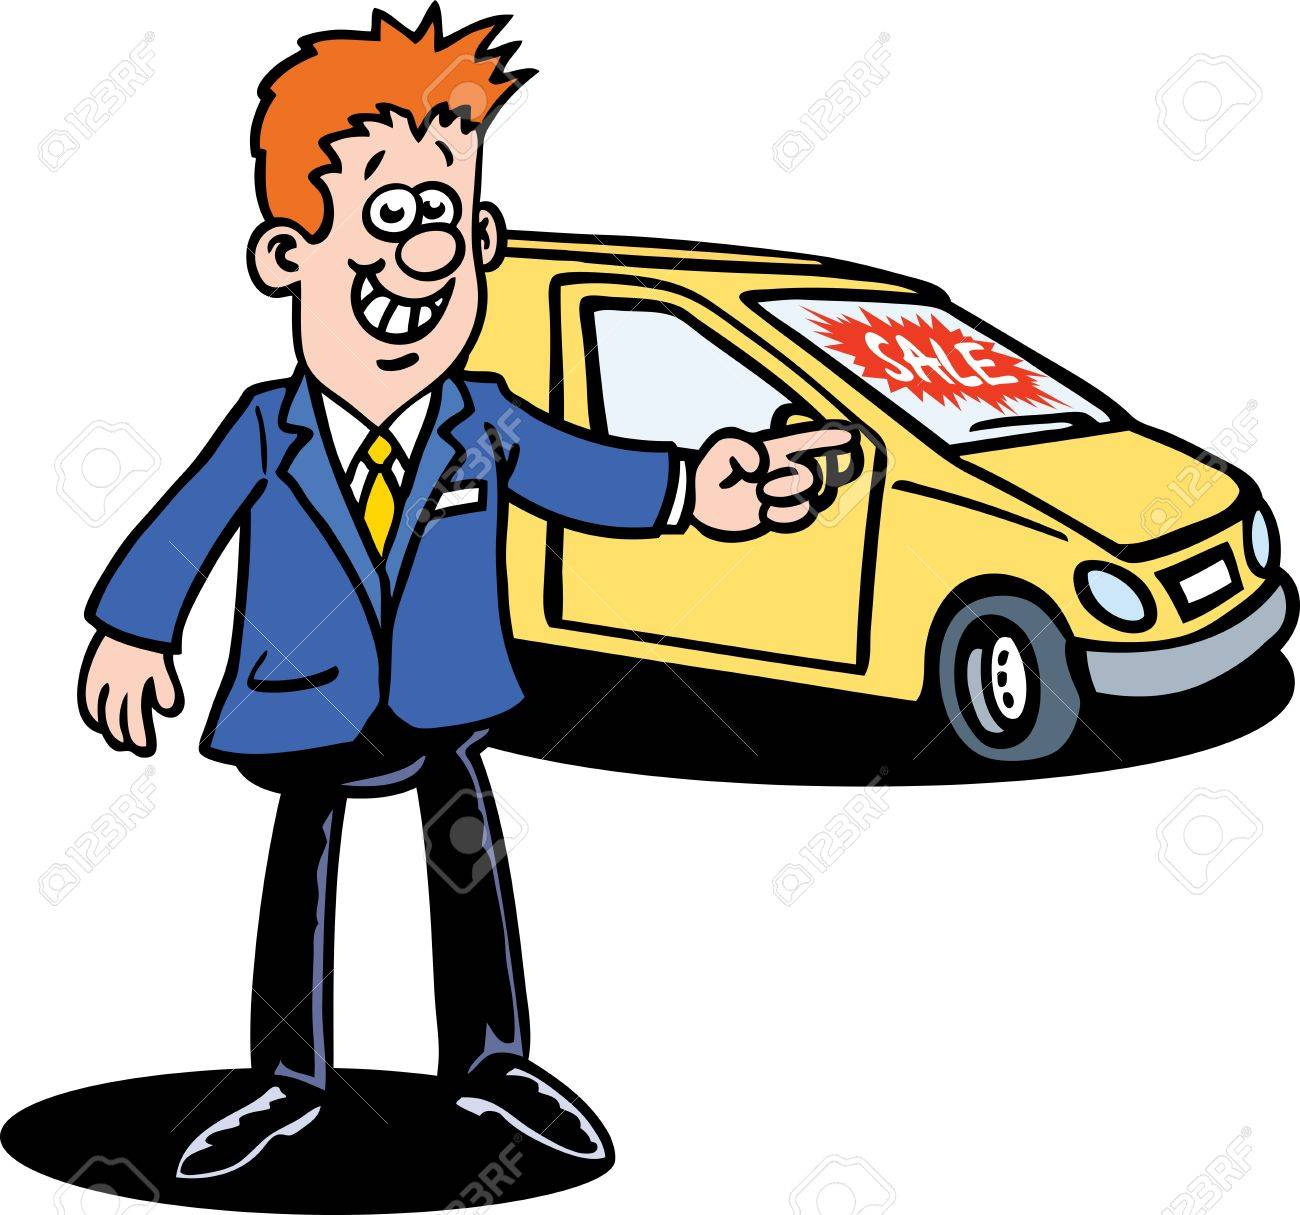 Business team cartoon characters cartoon vector cartoondealer com - Car Dealer Stock Vector 9349488 Car Dealer Cartoon